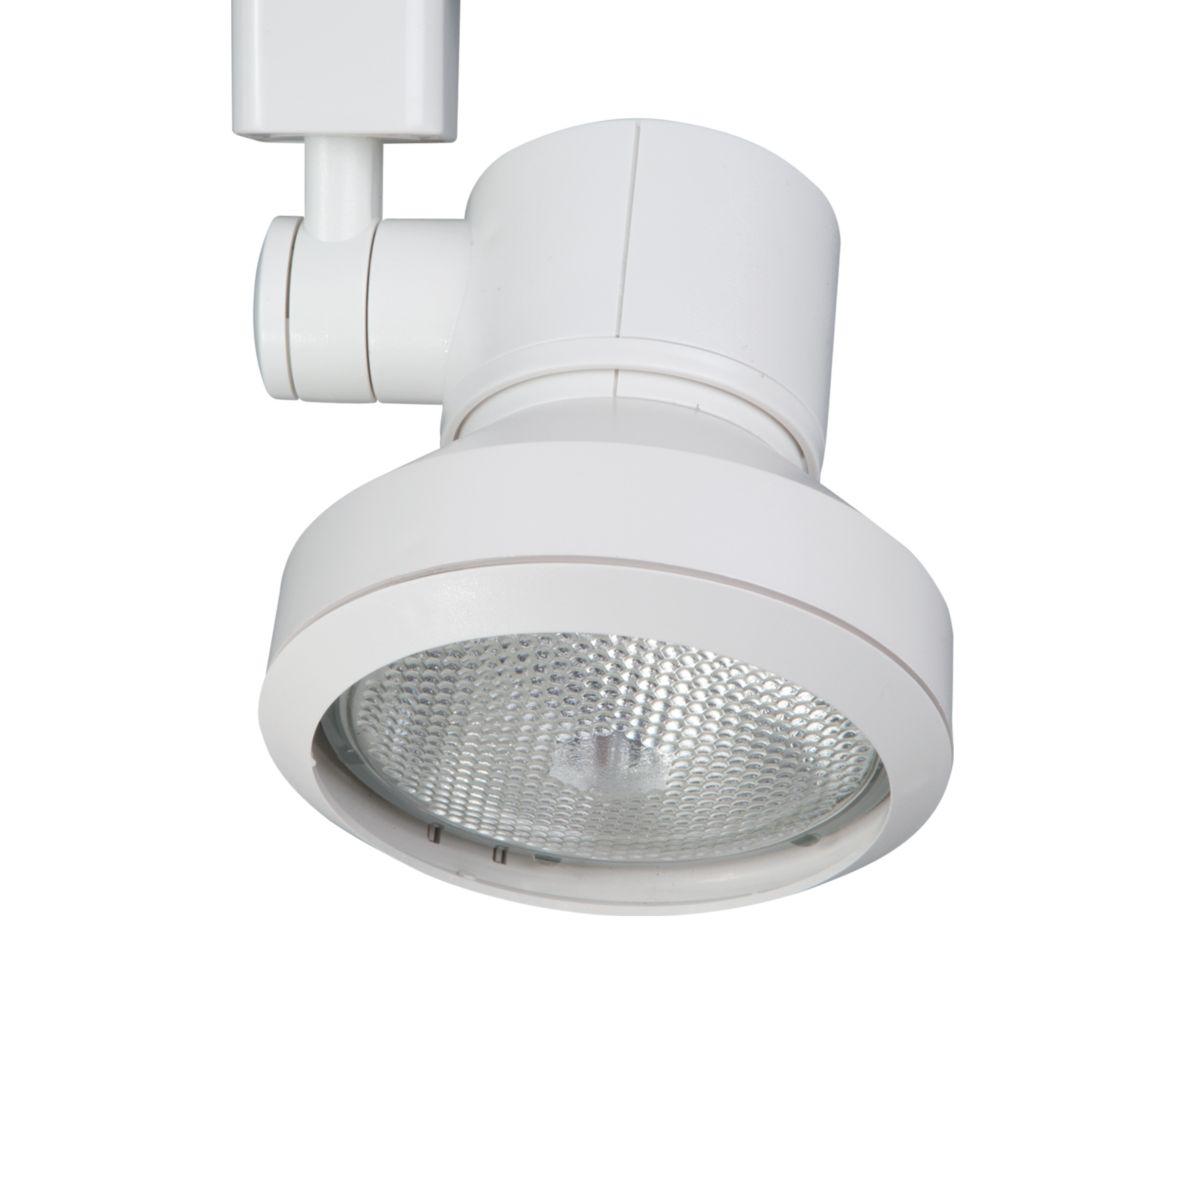 L284 Light Shield